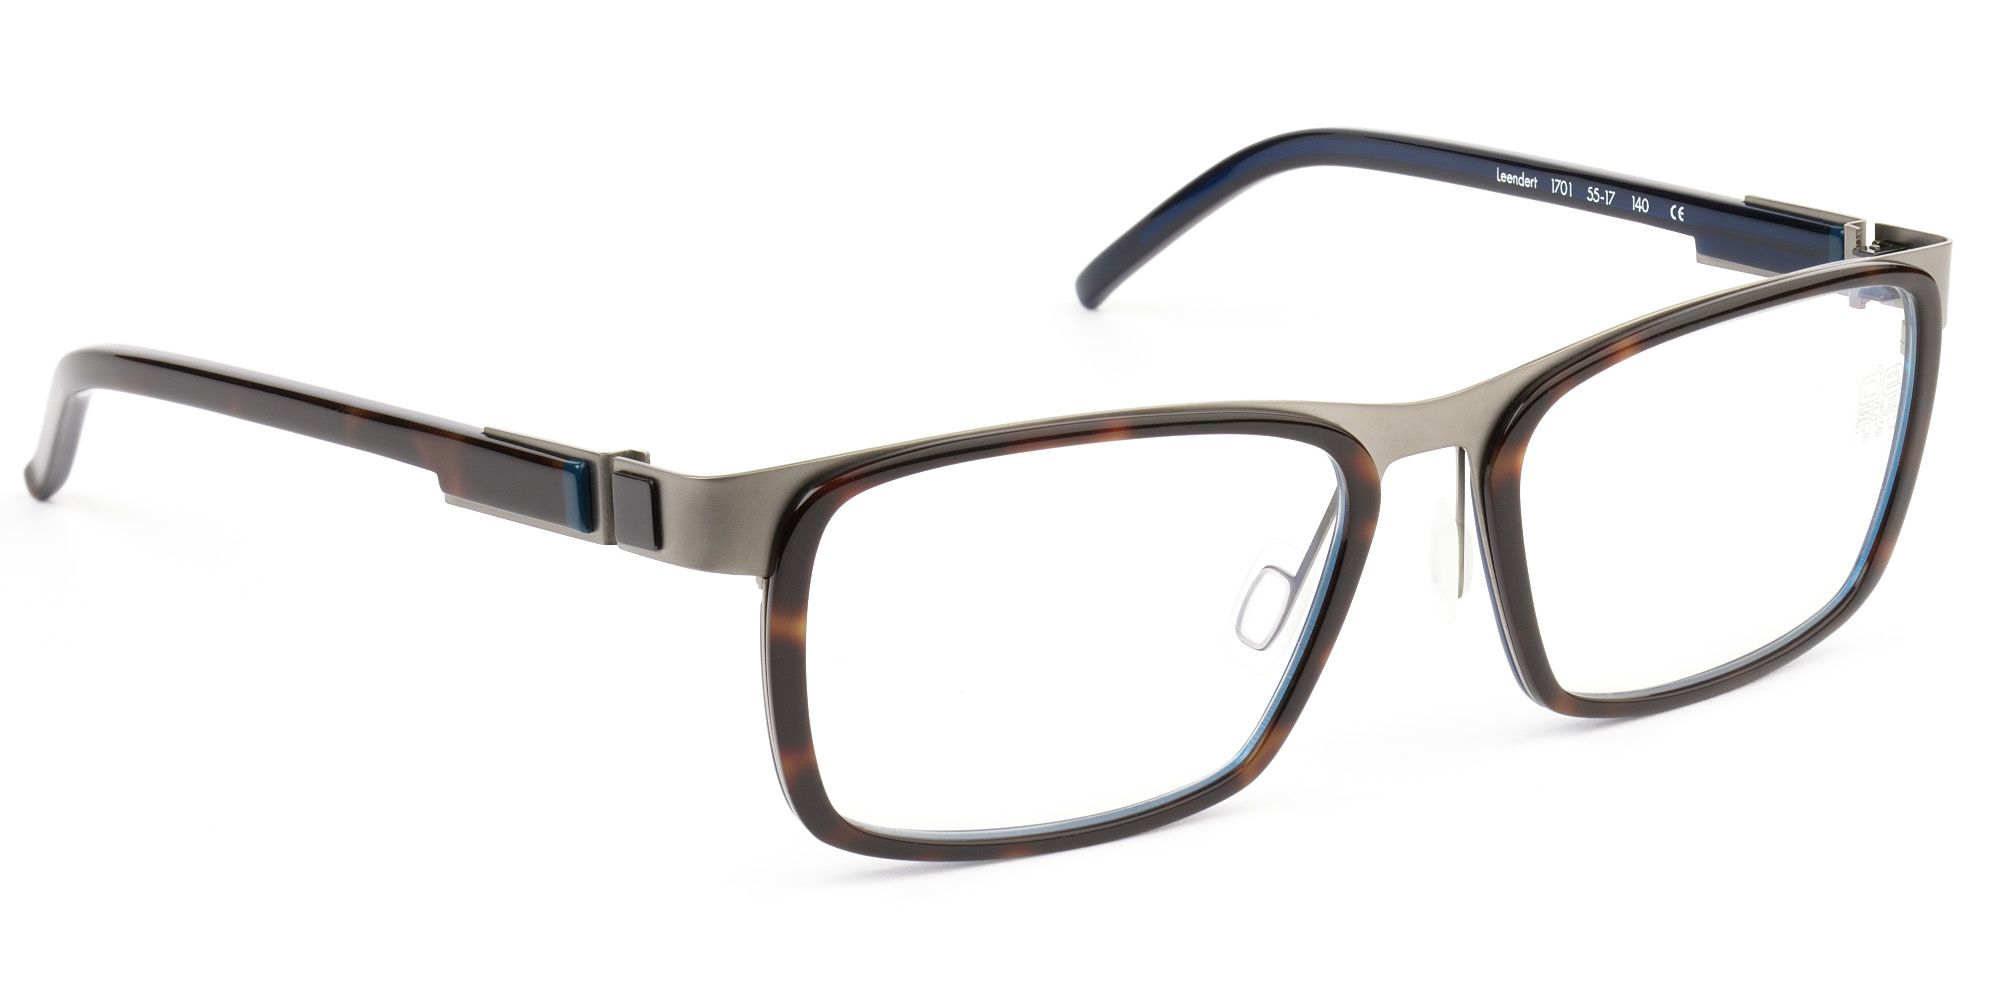 2944847560de De Stijl Holland 1924 eyewear  men eyeglasses frame LEENDERT in tortoise  shell brown with blue